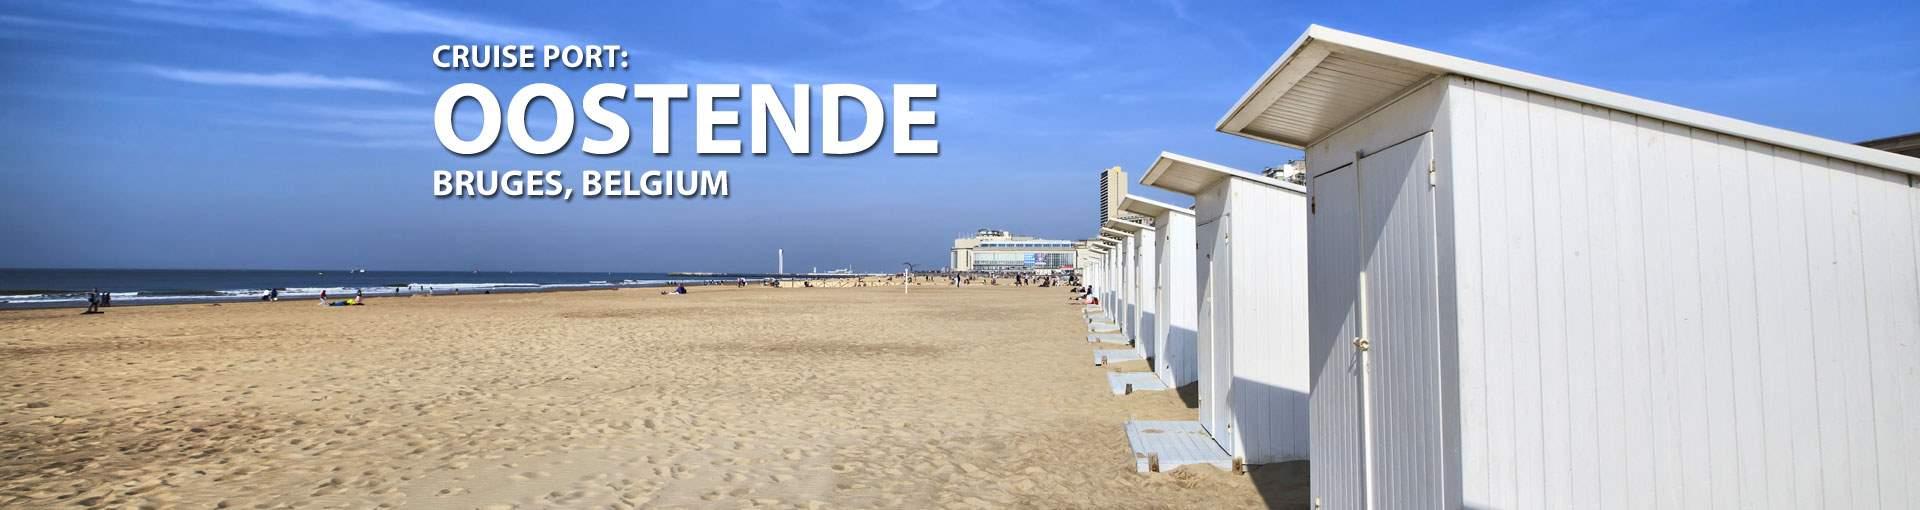 Cruises to Oostende (Bruges), Belgium